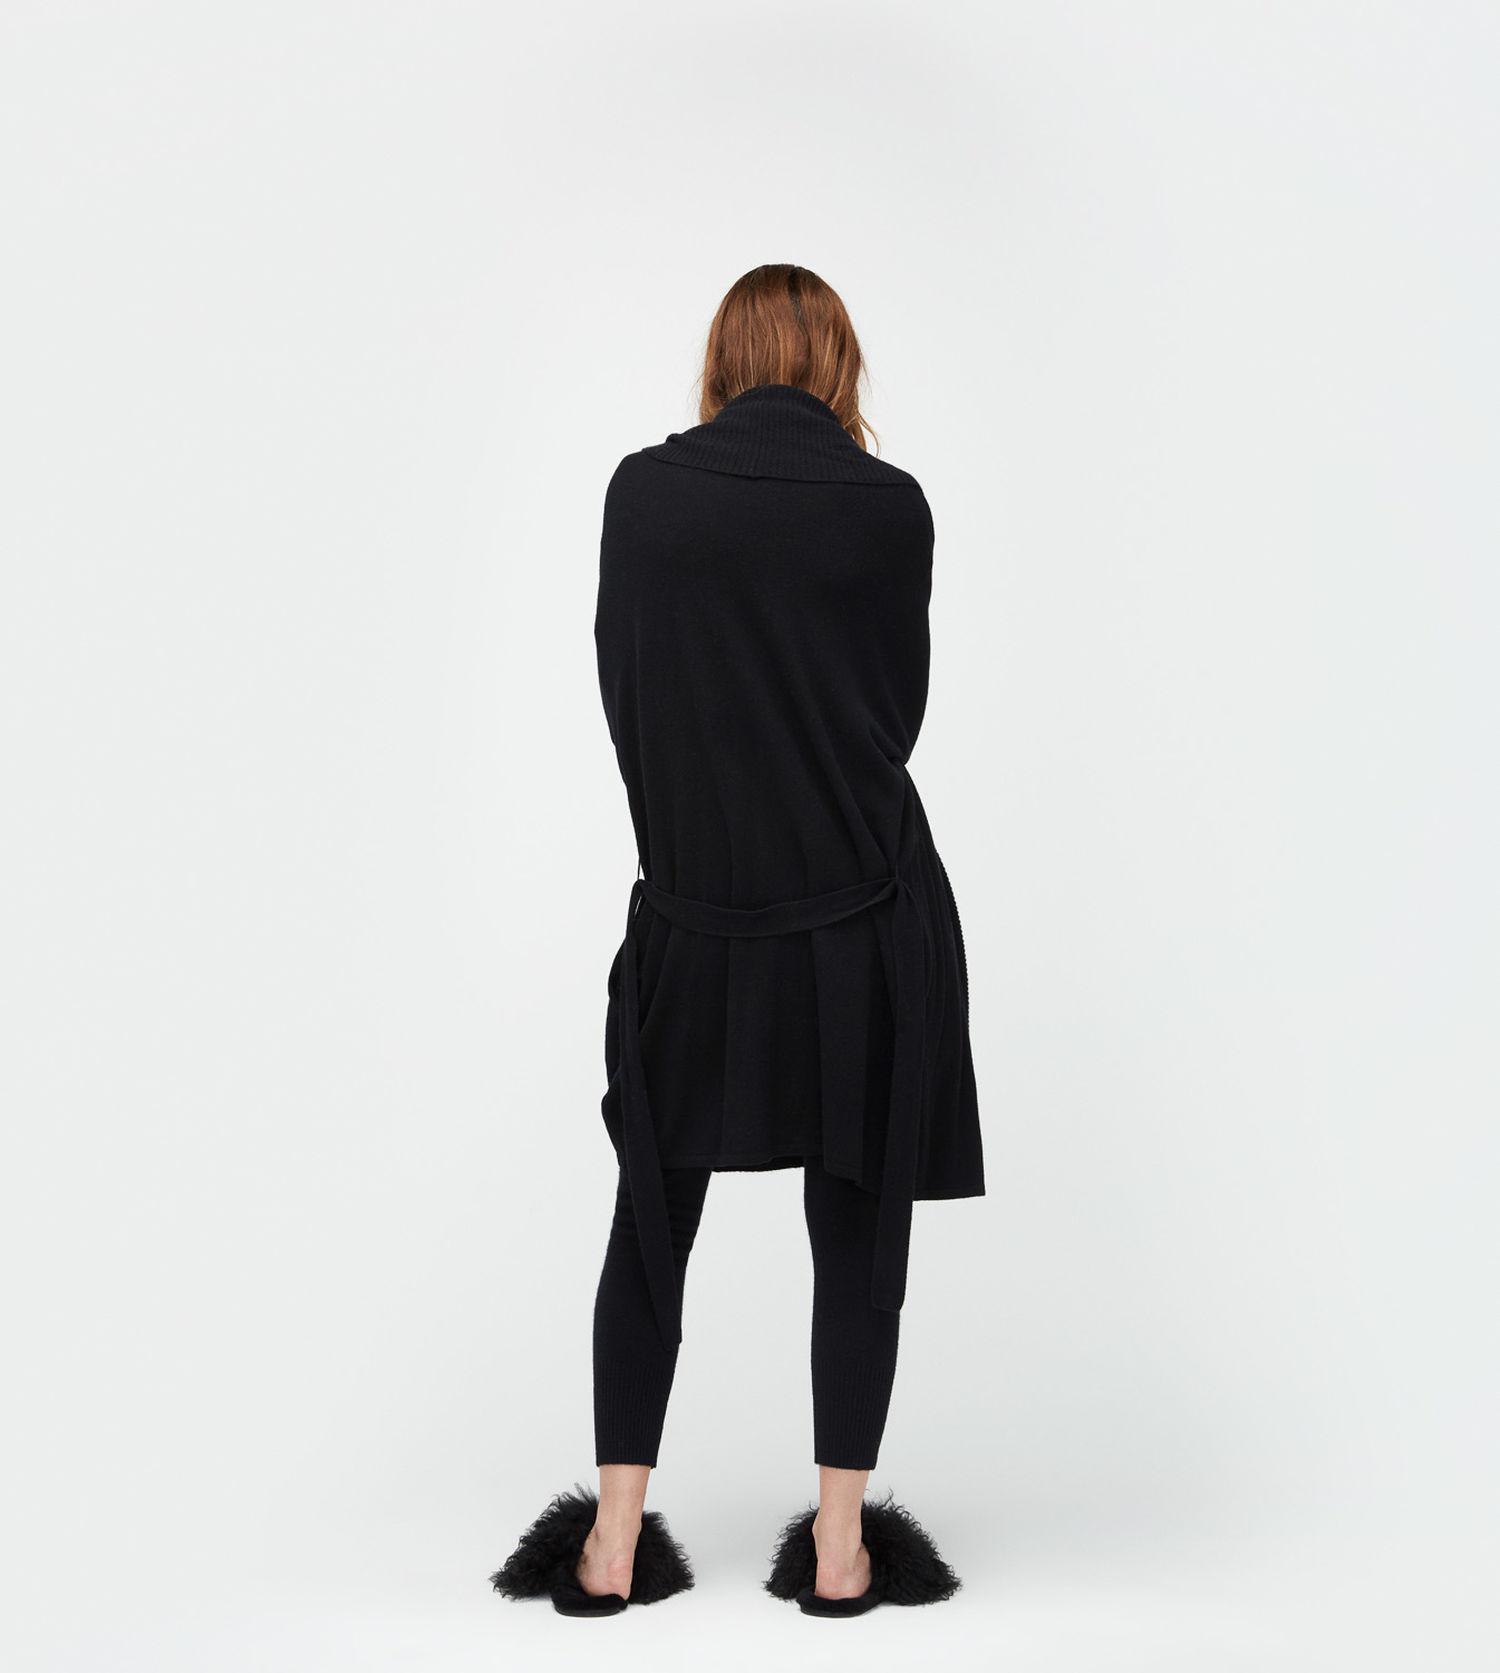 Lyst - Ugg Women s Cheyenne Robe in Black 97ffa01bf